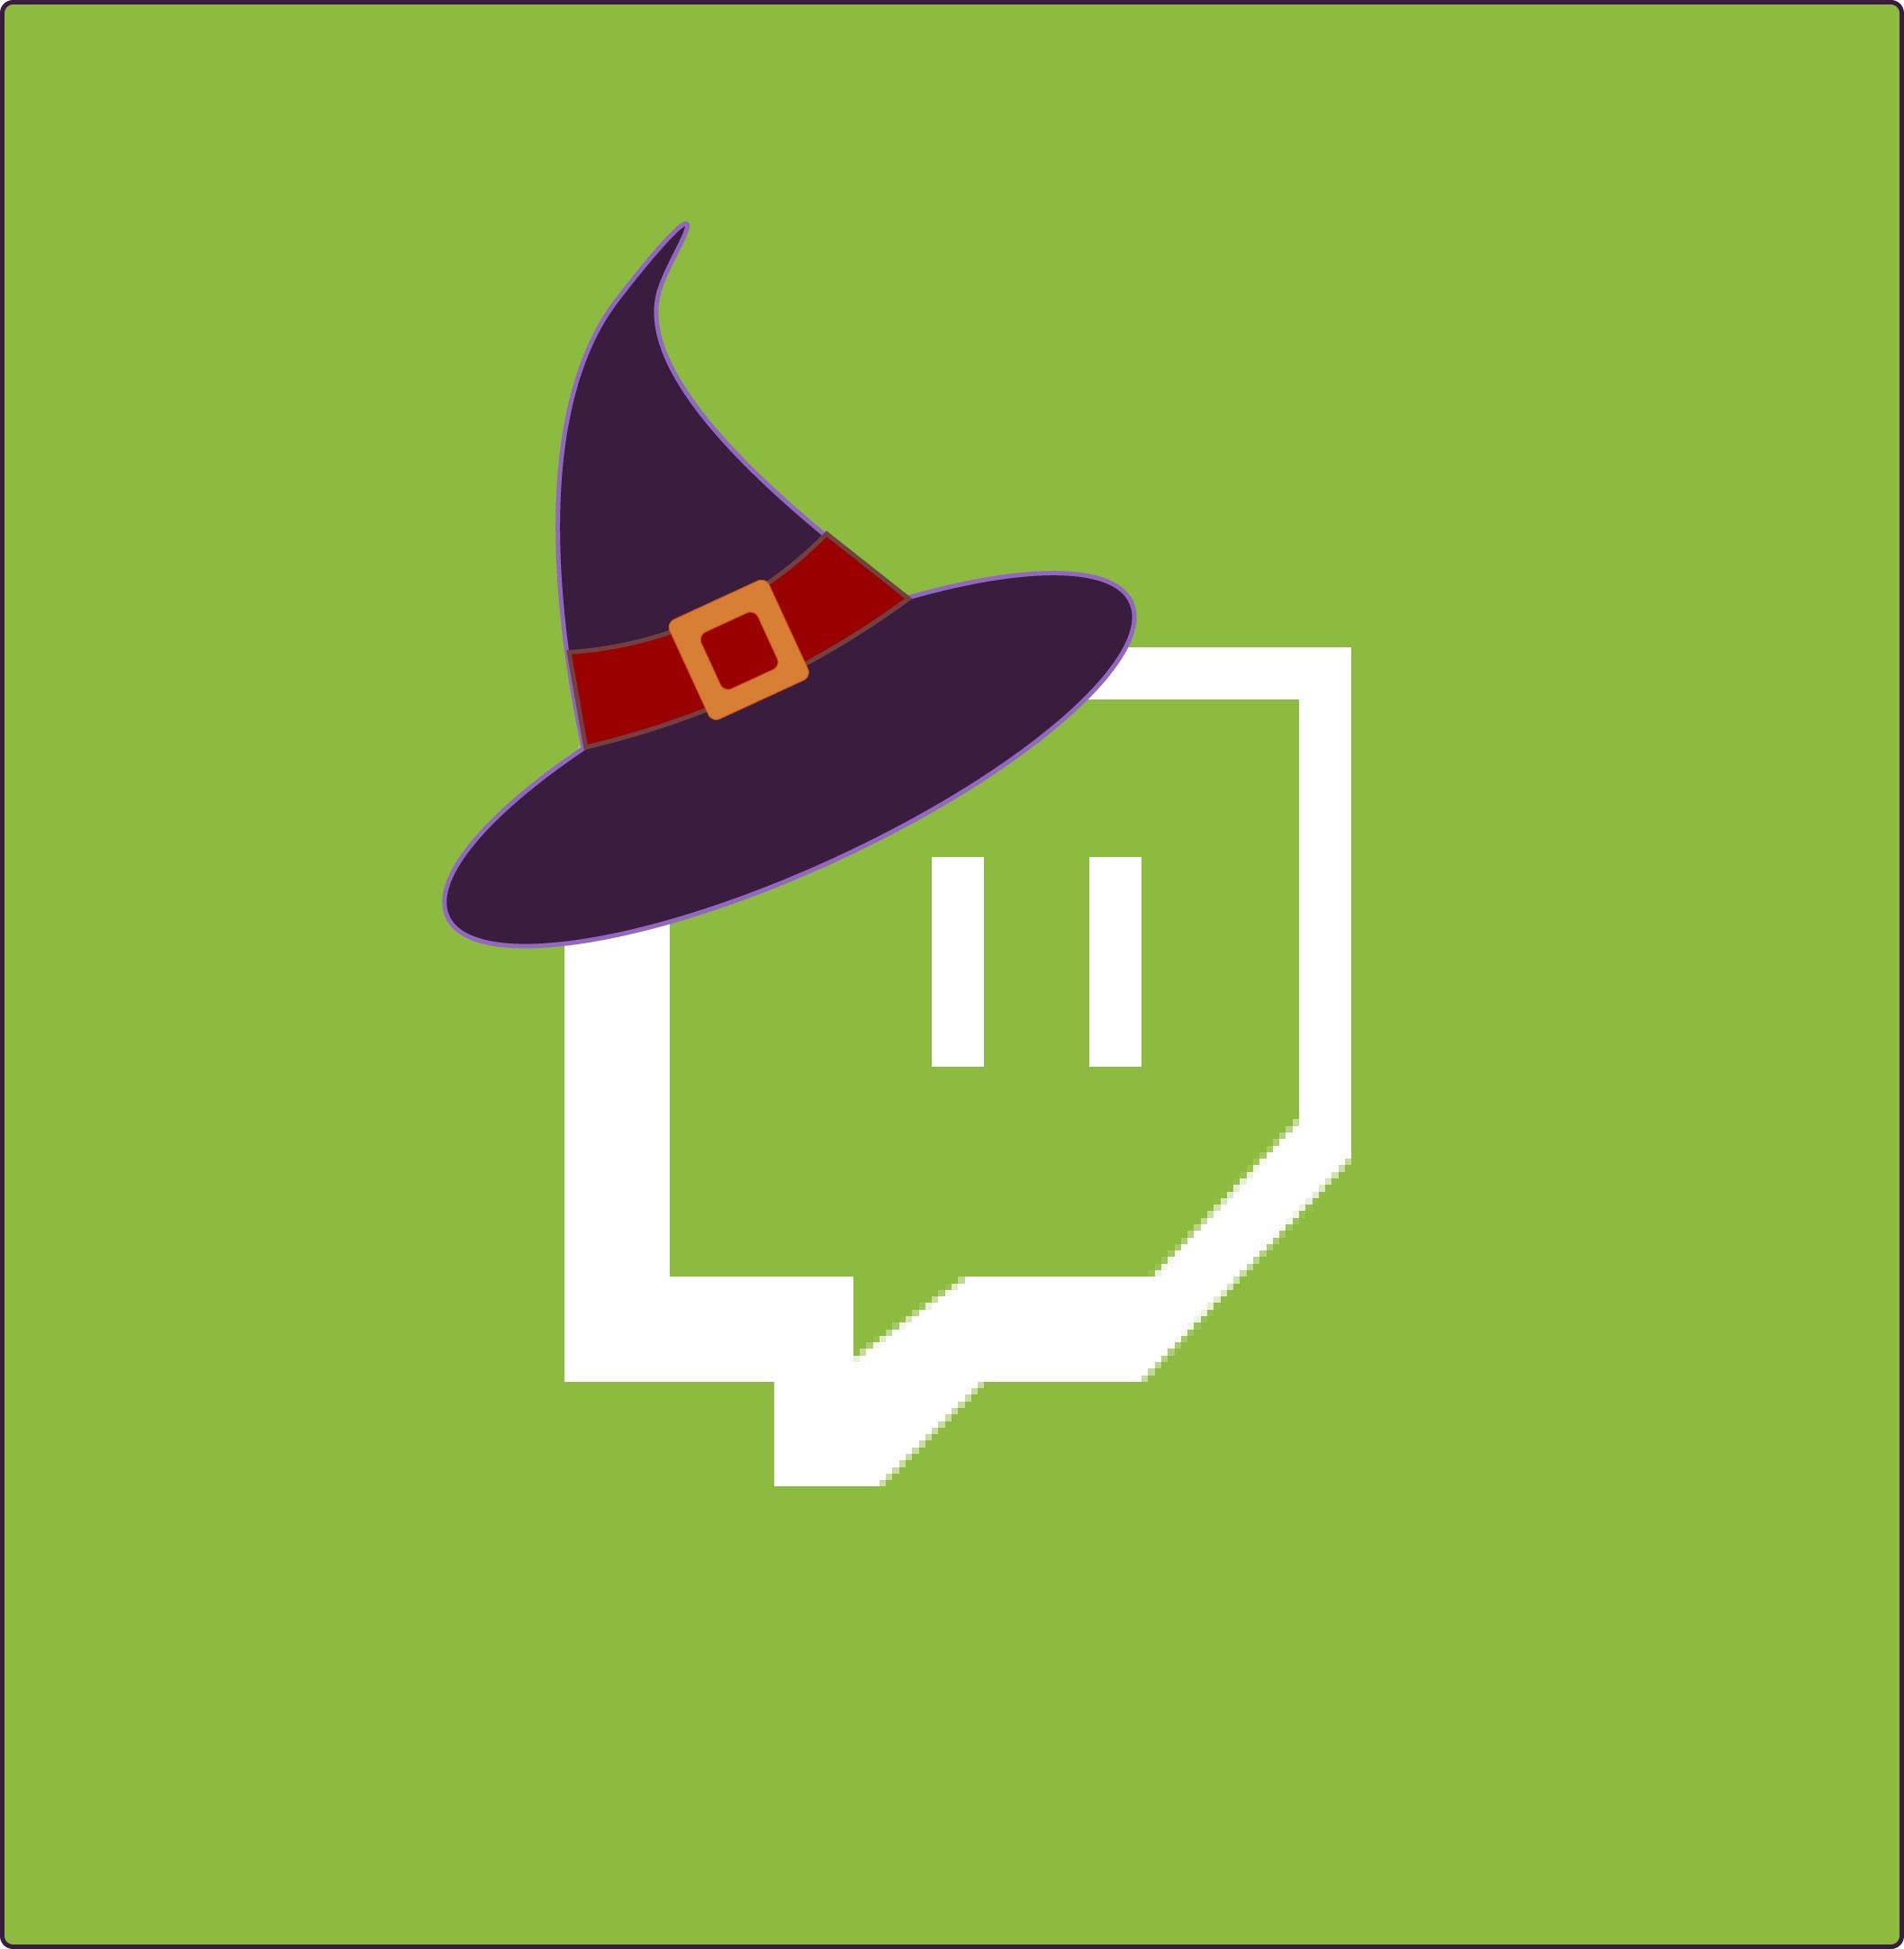 Twitch Halloween App Icon from HalloweenCostumes.com